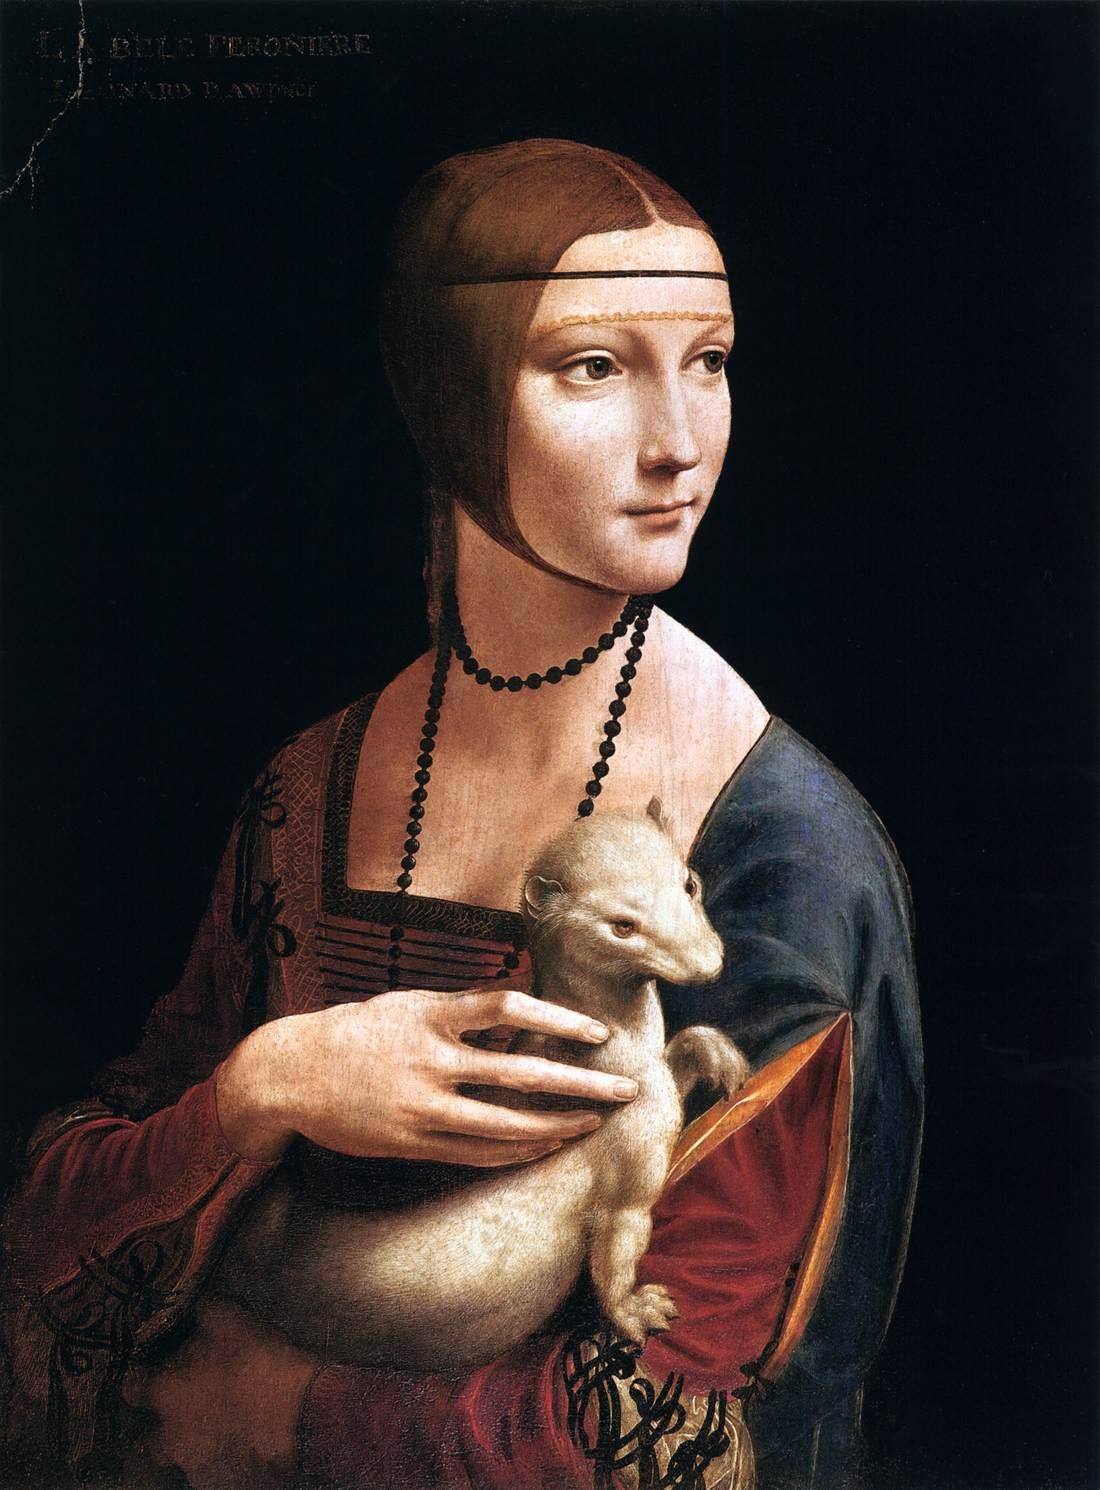 Lady with an Ermine, Leonardo da Vinci